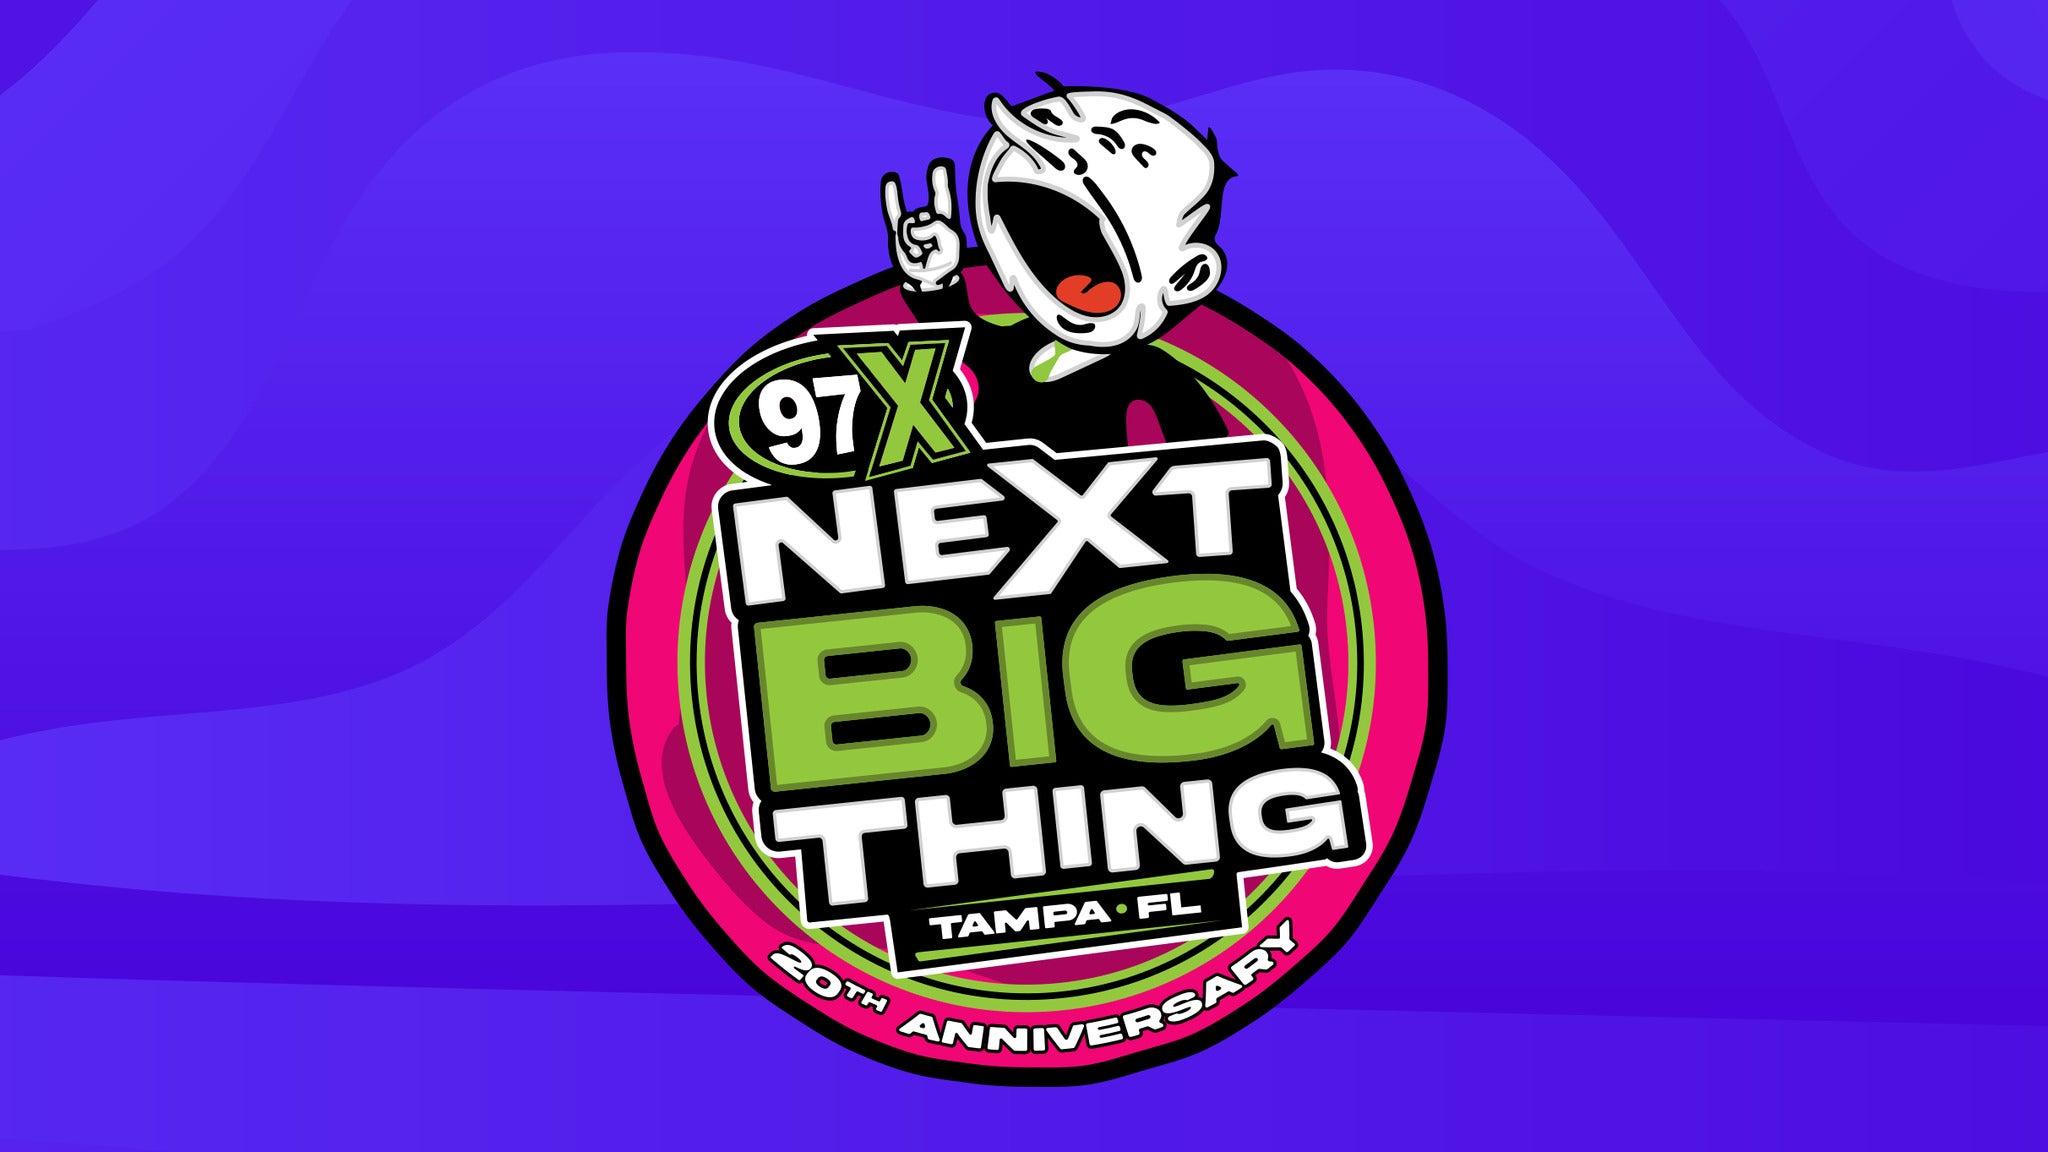 97X Next Big Thing - SUPER VIP Experience - Day 1